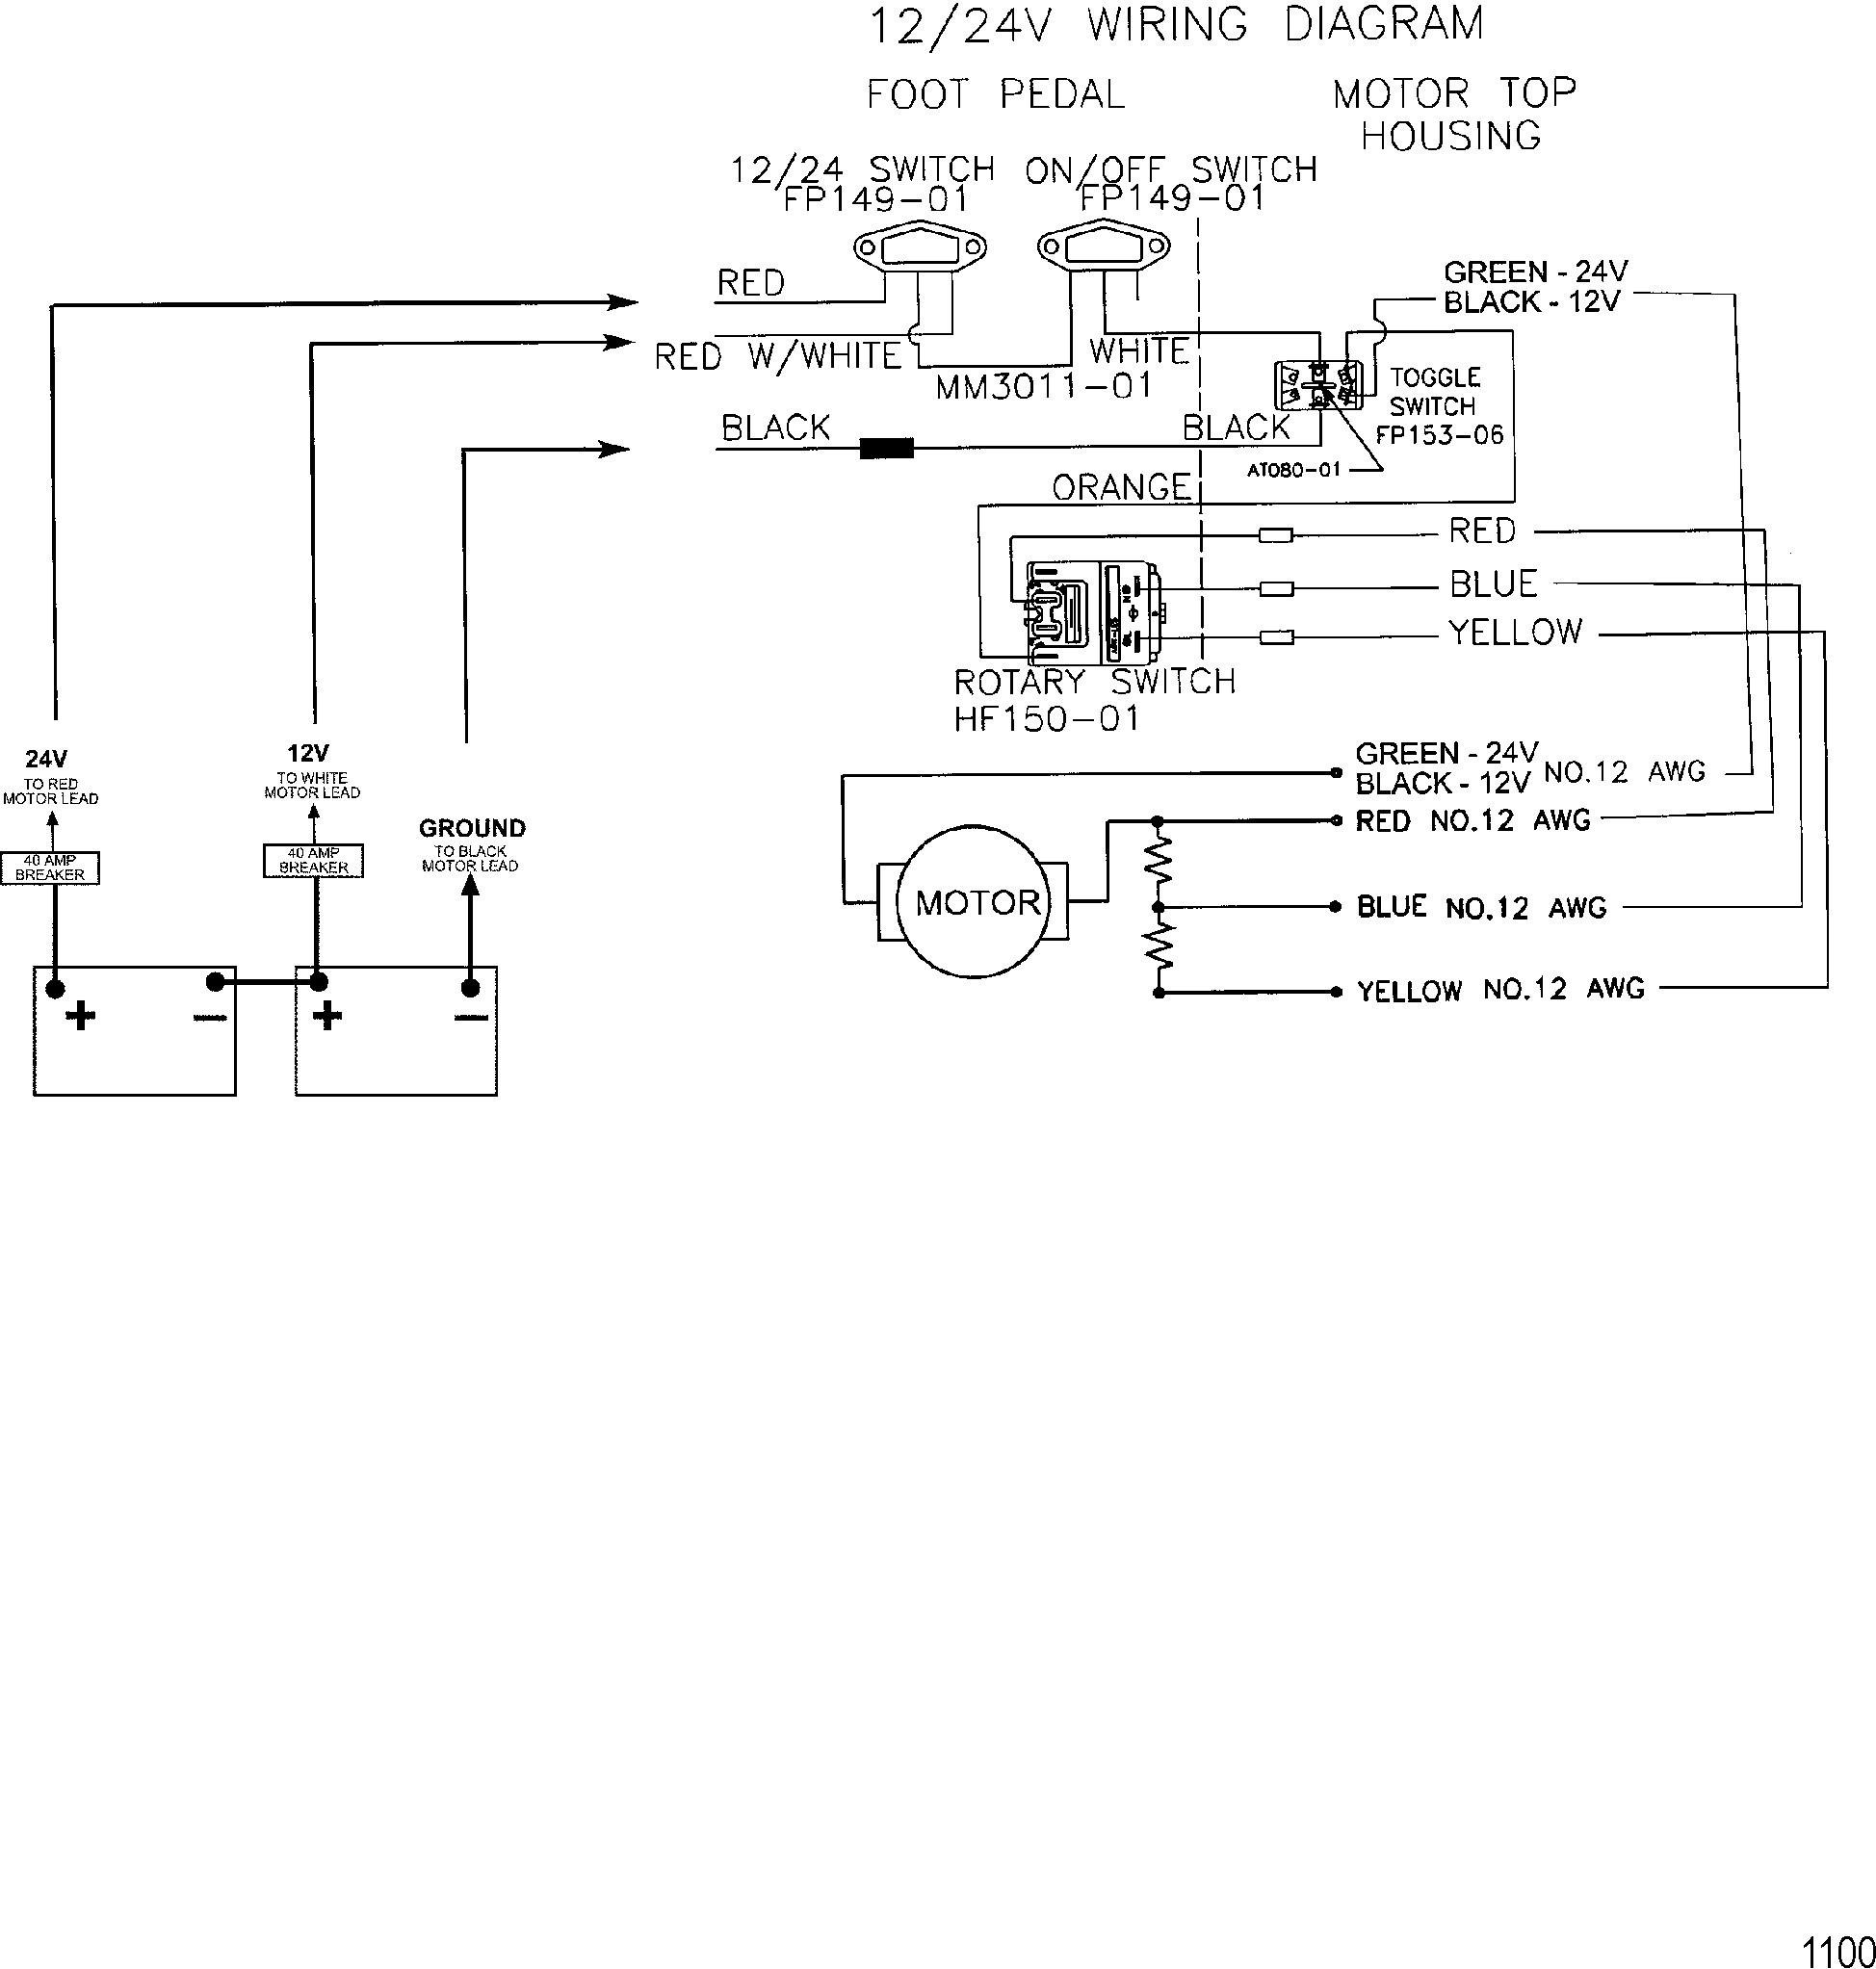 Beauteous 12V Trolling Motor Wiring Diagram 03 Chevy Yruck Is Like - 12V Trolling Motor Wiring Diagram